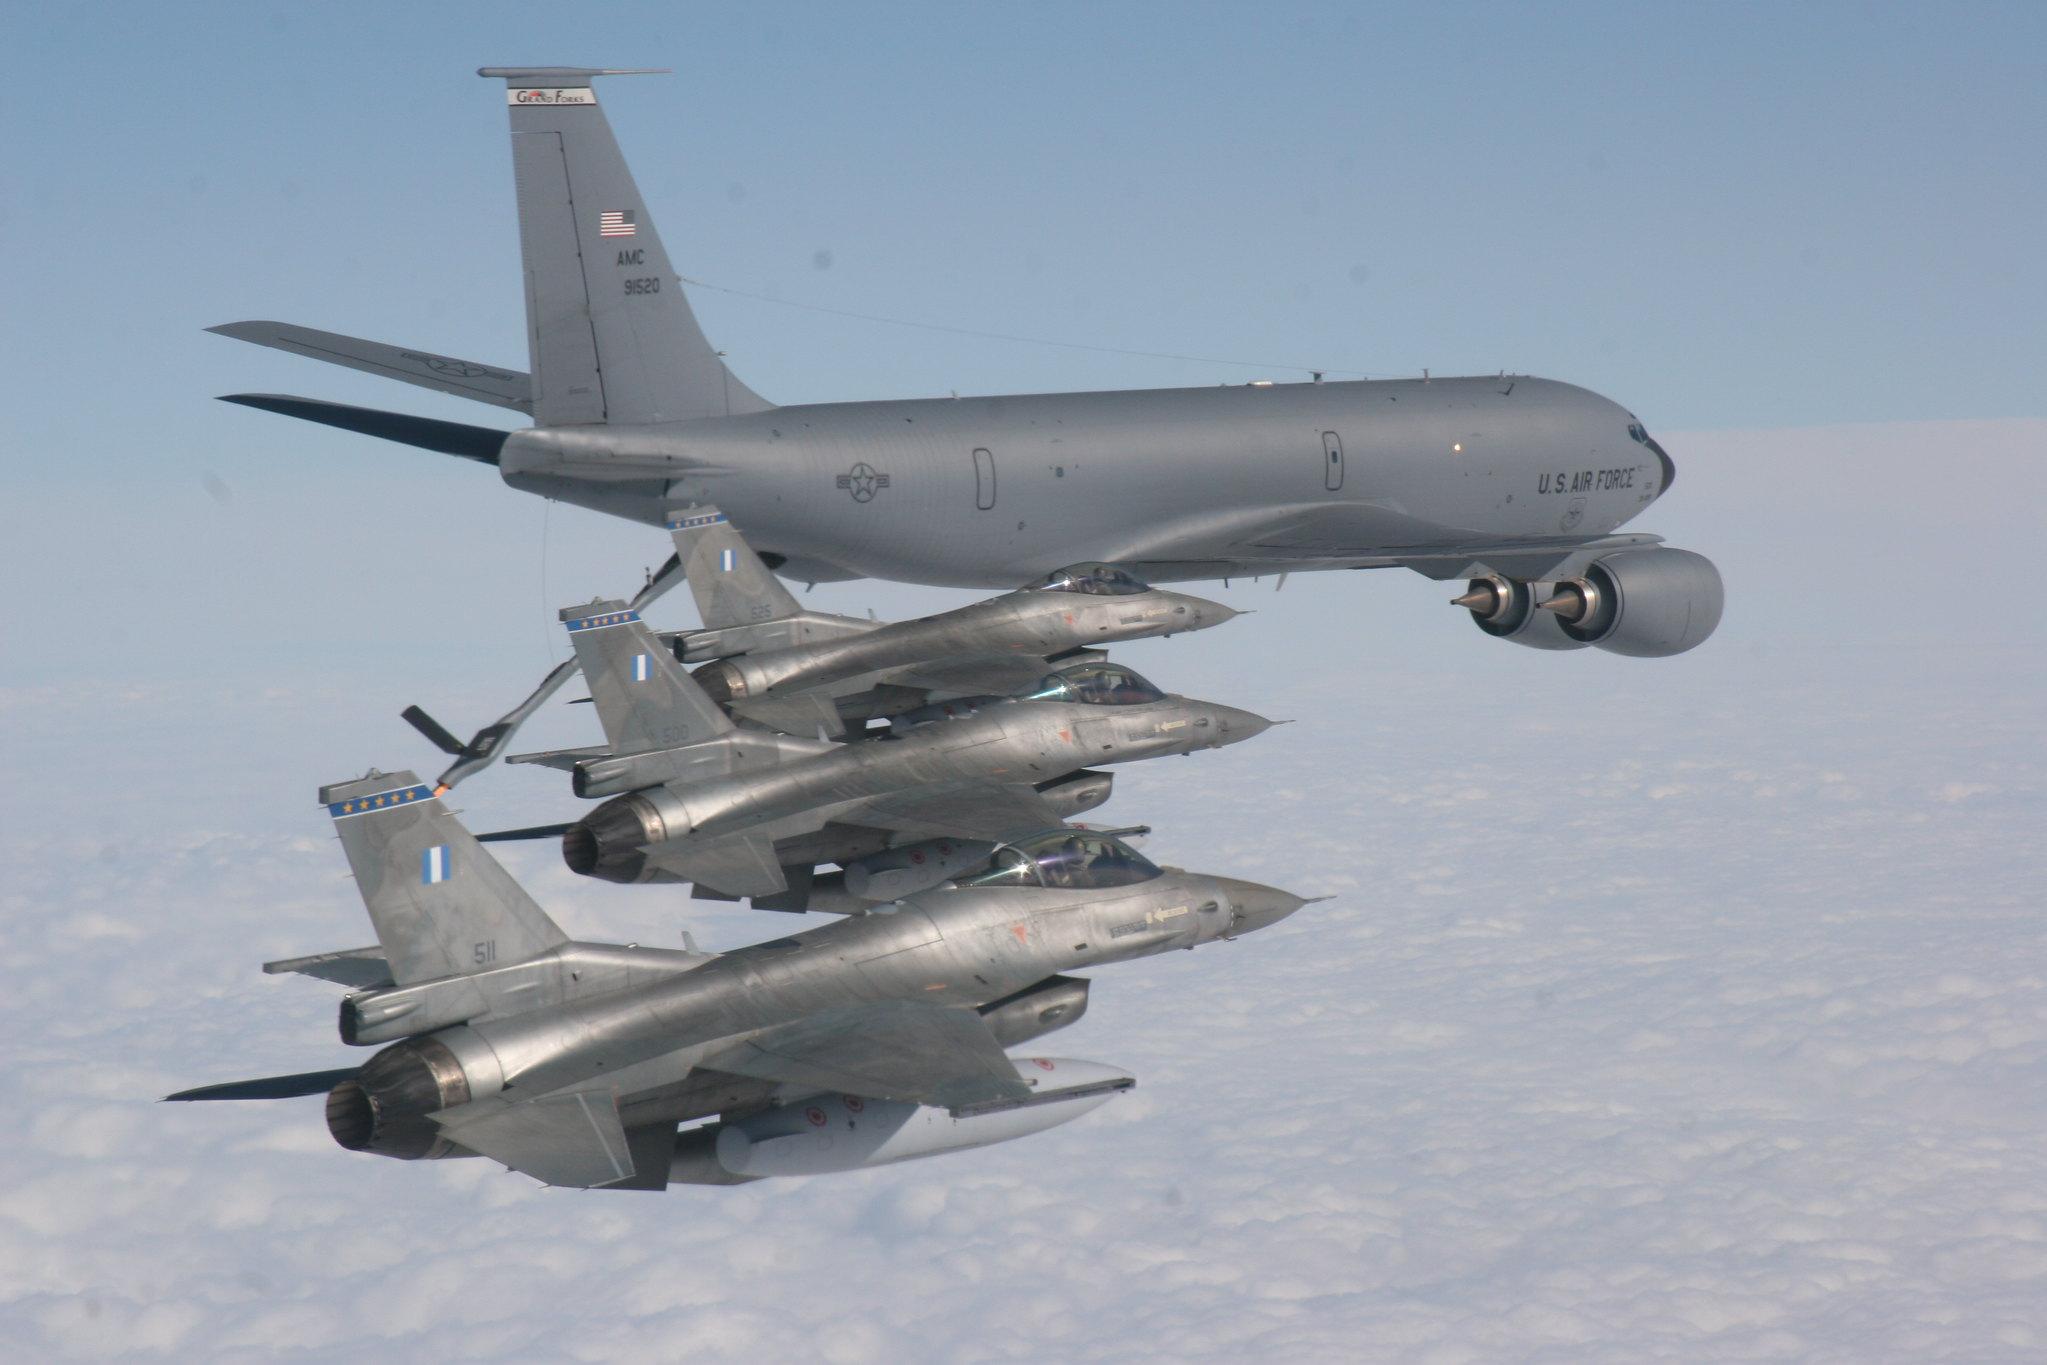 MQ-9 «Reaper» κι ιπτάμενα tanker | Nέα «asset» στον Ηνίοχο